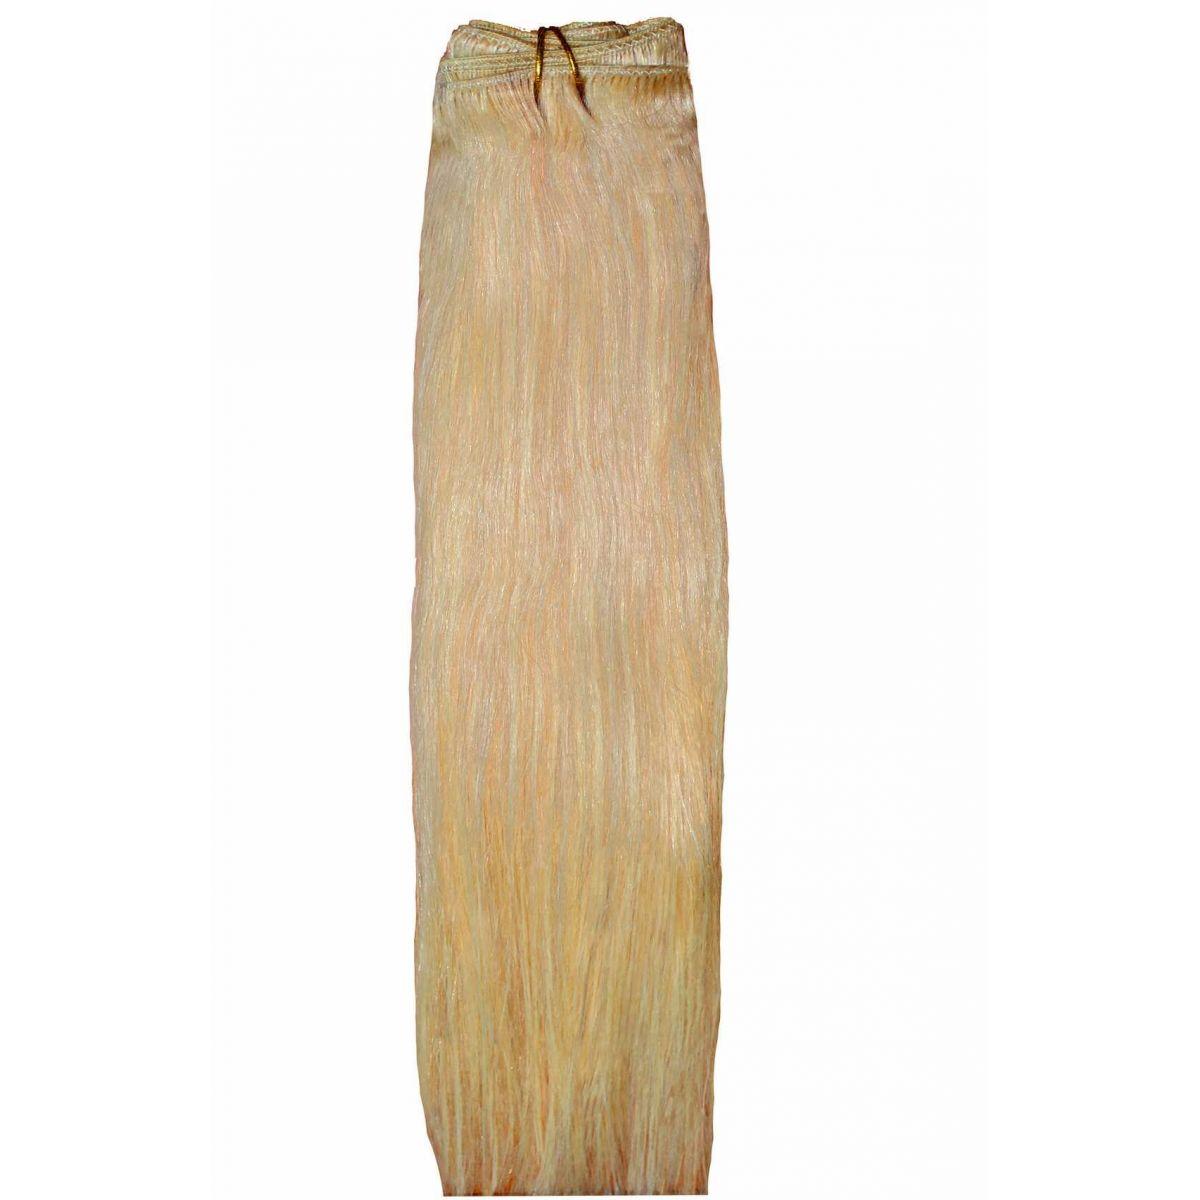 Mega Hair de Tela Loiro Claro 160g Natural Cabelos Humano